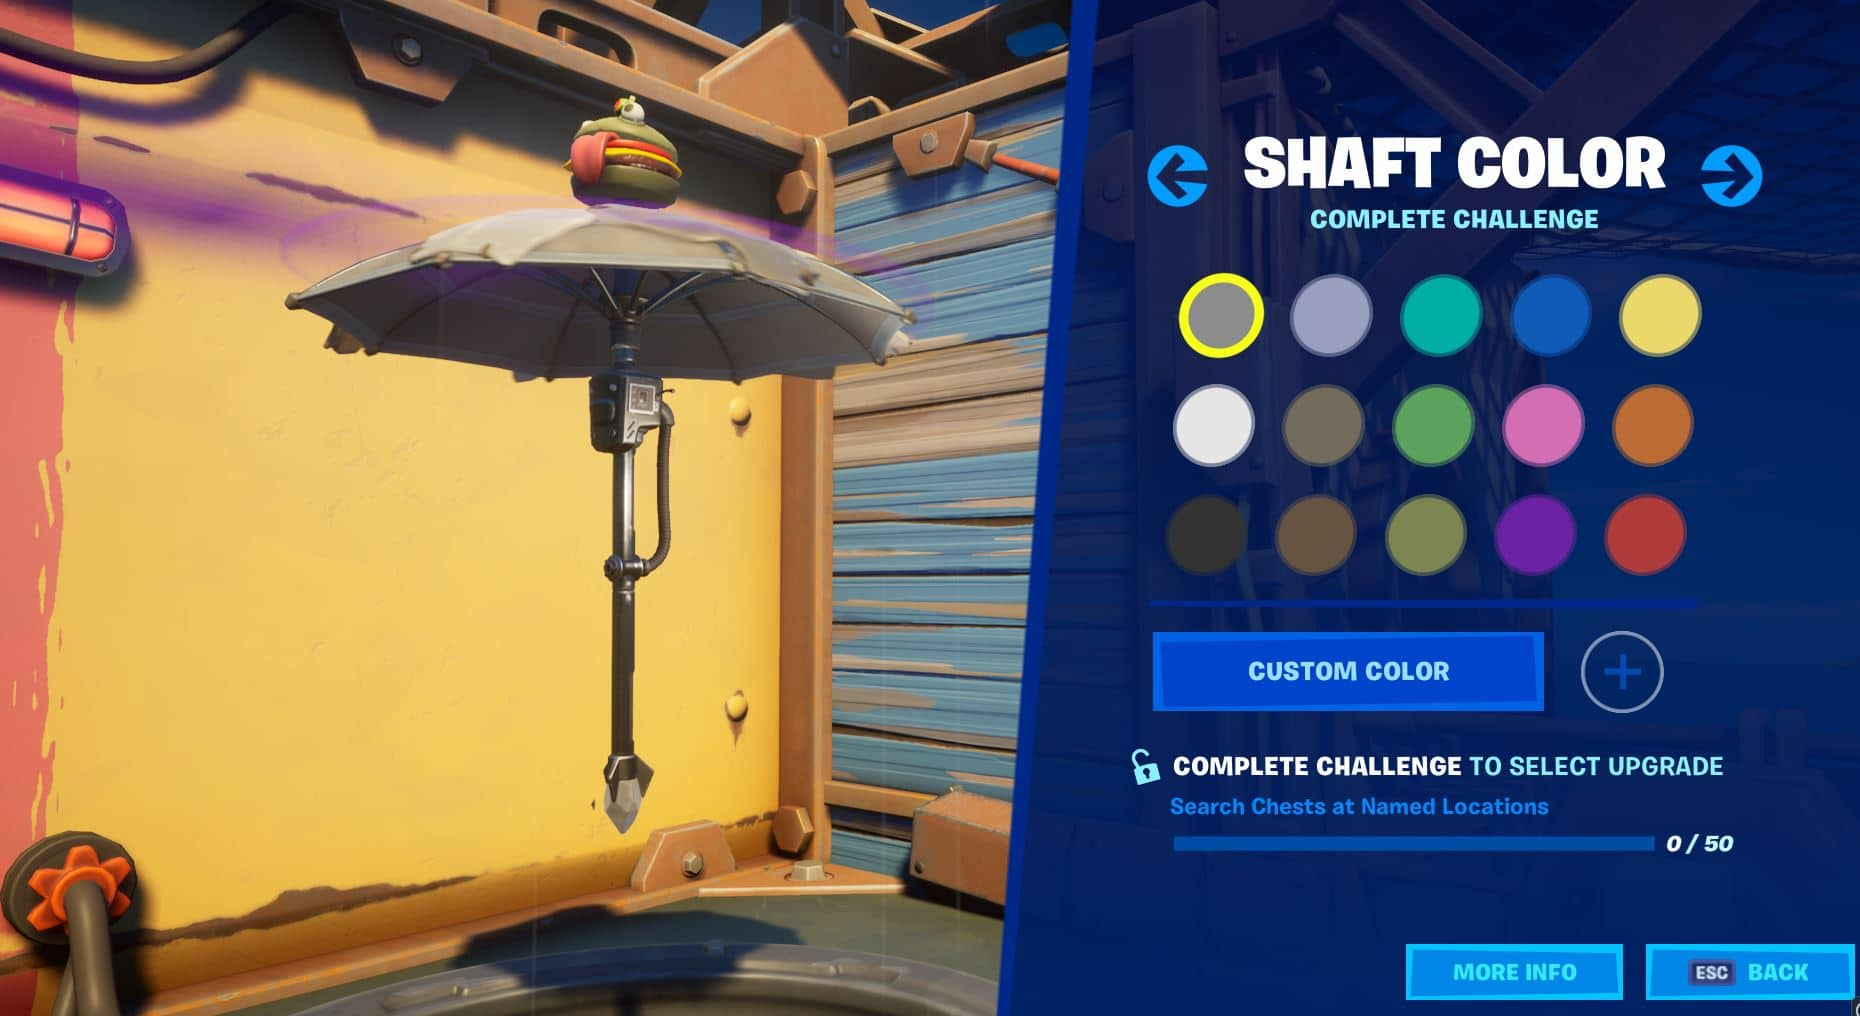 Fortnite Build A Brella Shaft Color Challenge